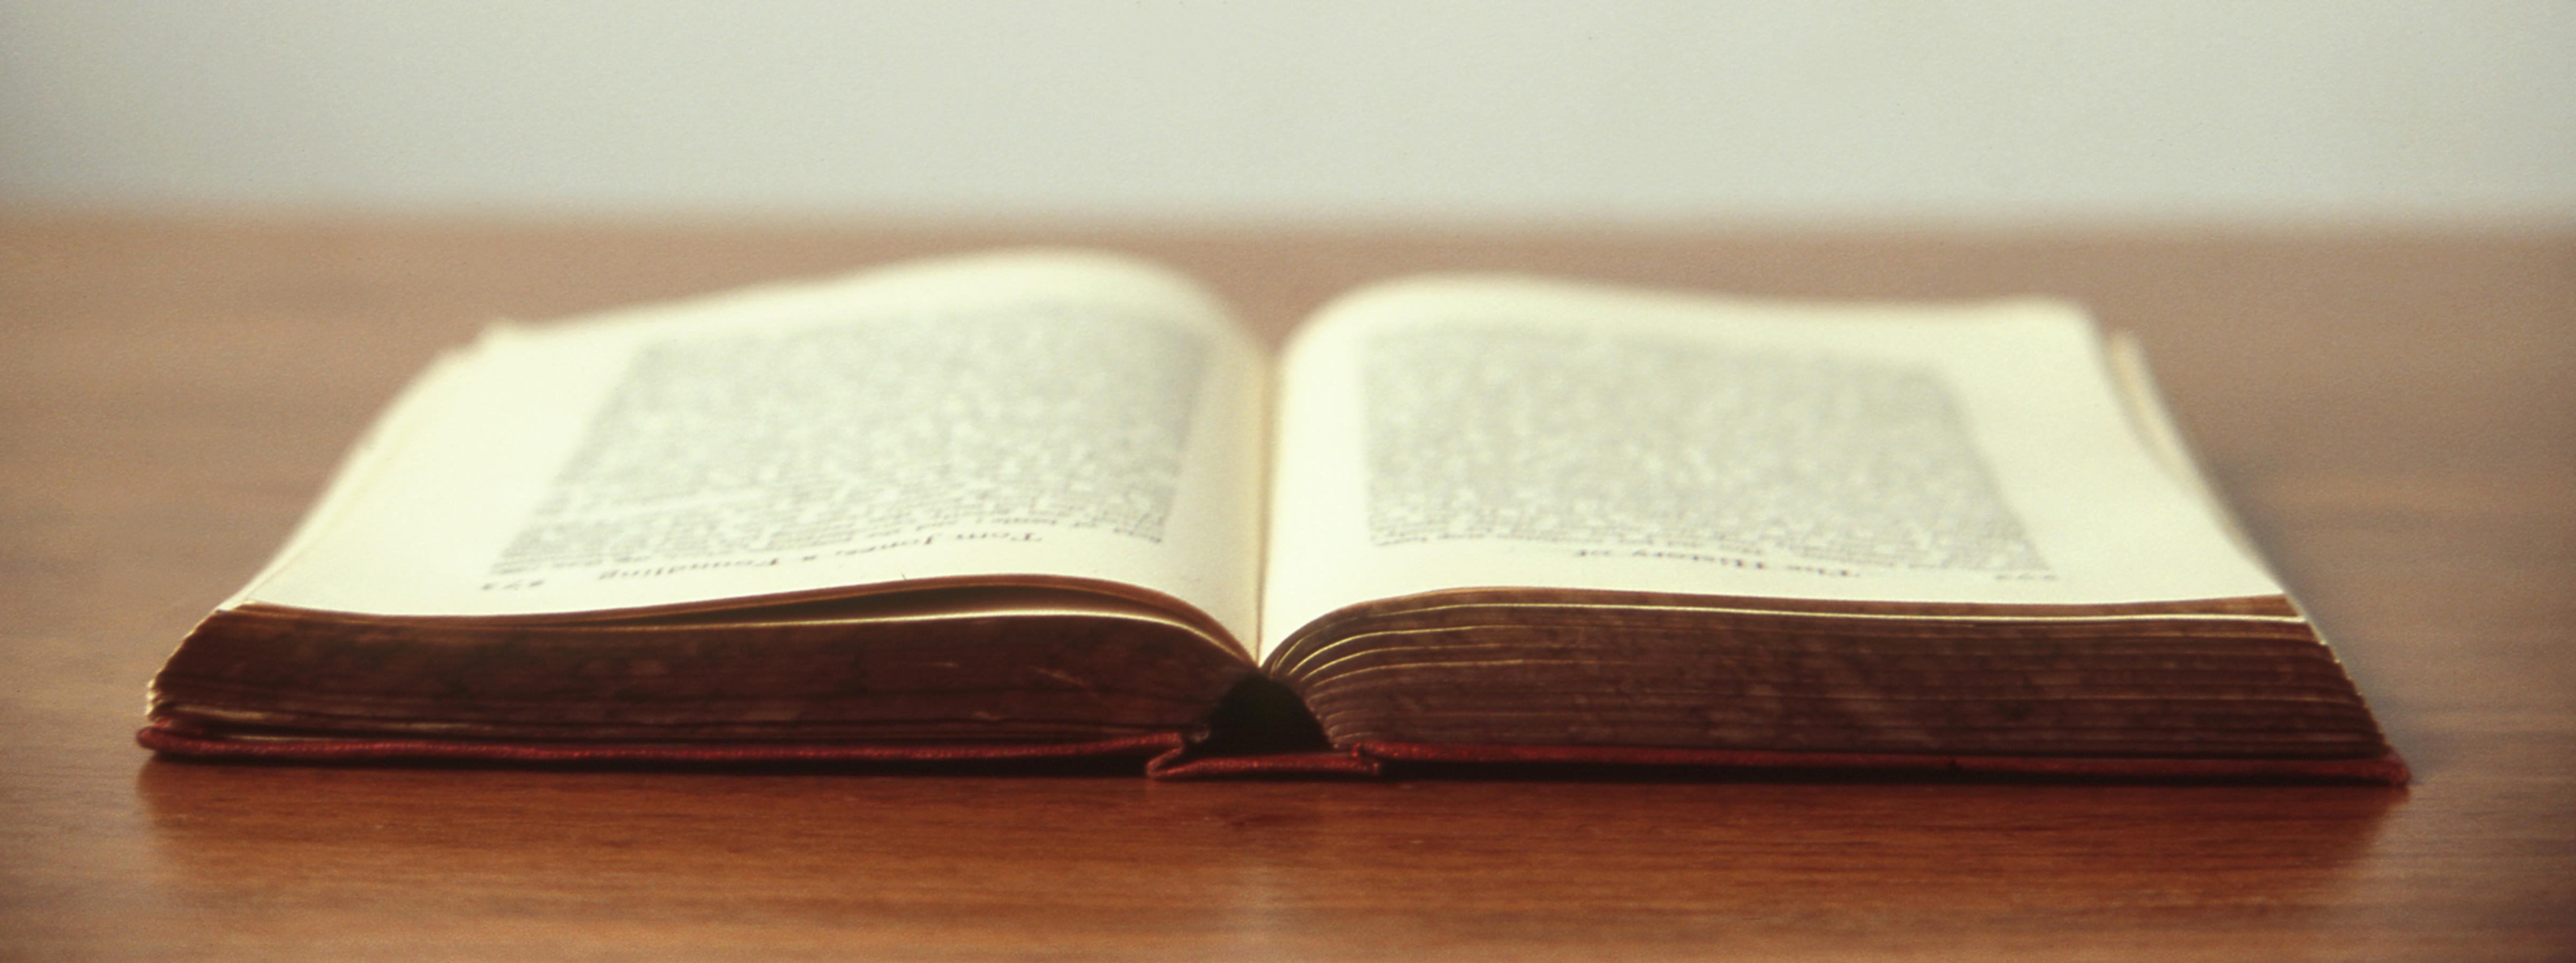 Reiki Healing inclusive of Reiki Reading